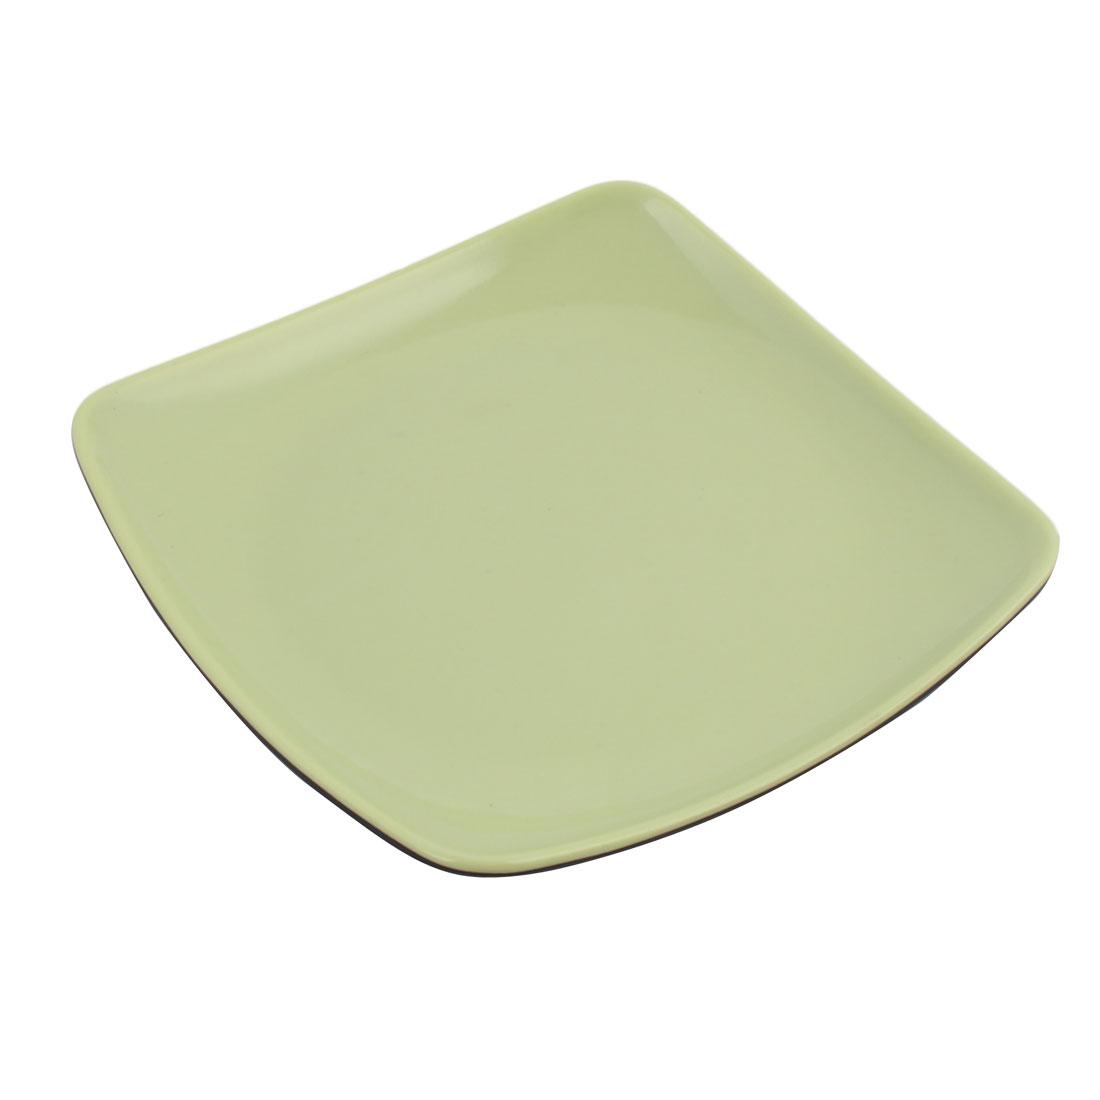 Kitchen Plastic Square Dinnerware Food Vegetable Dish Plate Green 19cm x 19cm